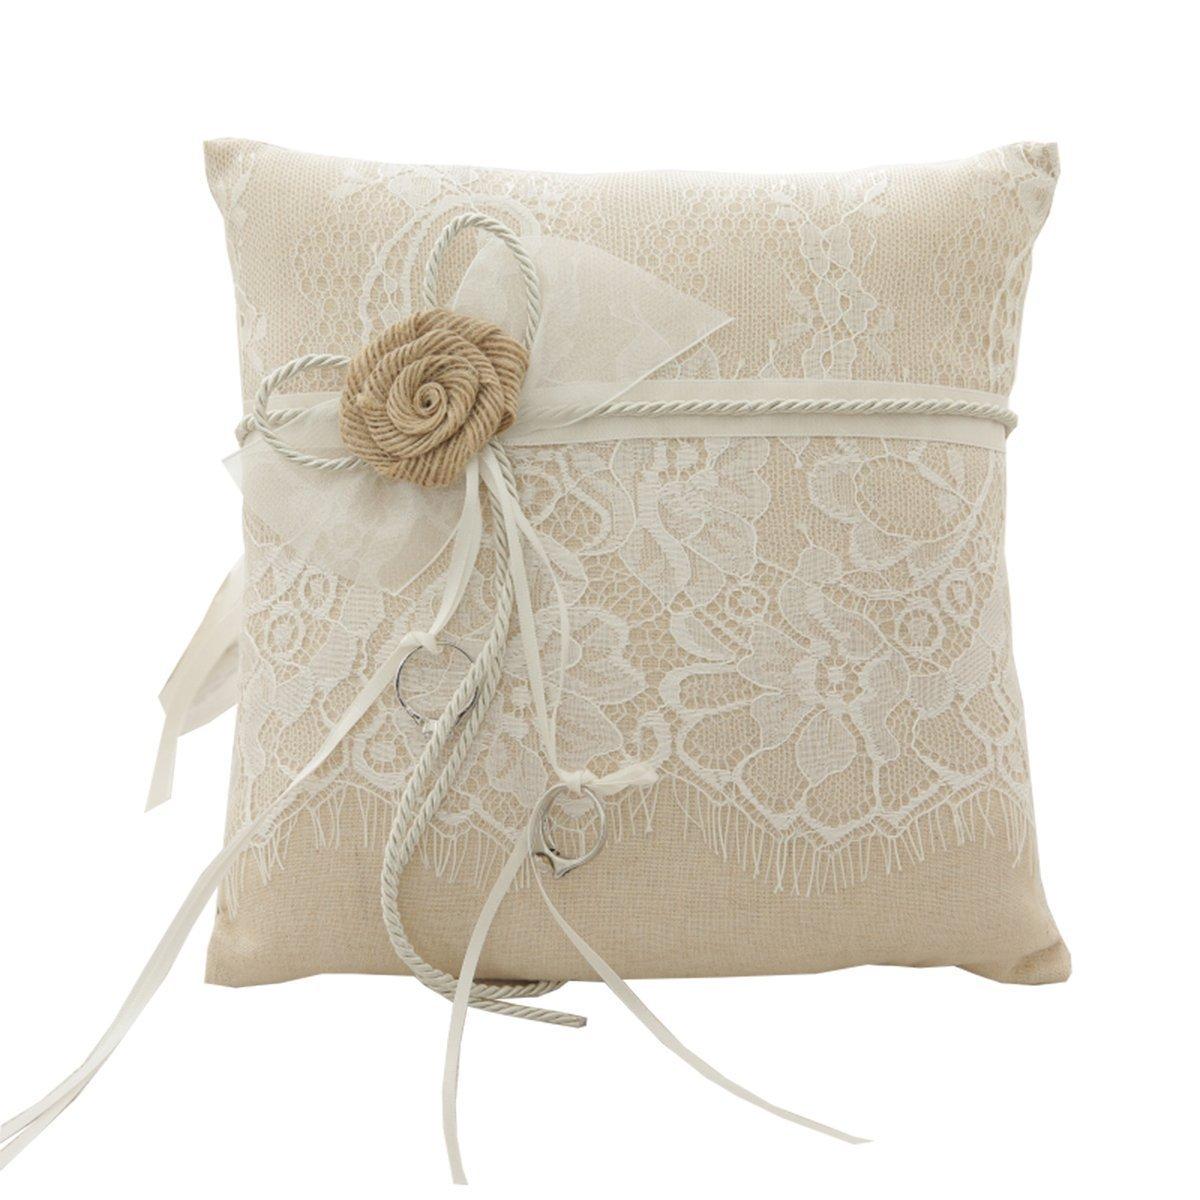 SCWEDDING Handmade Hessian Wedding Ring Pillow Rustic Burlap Ring Cushion Bearing with Eyelash Lace 21cm21cm